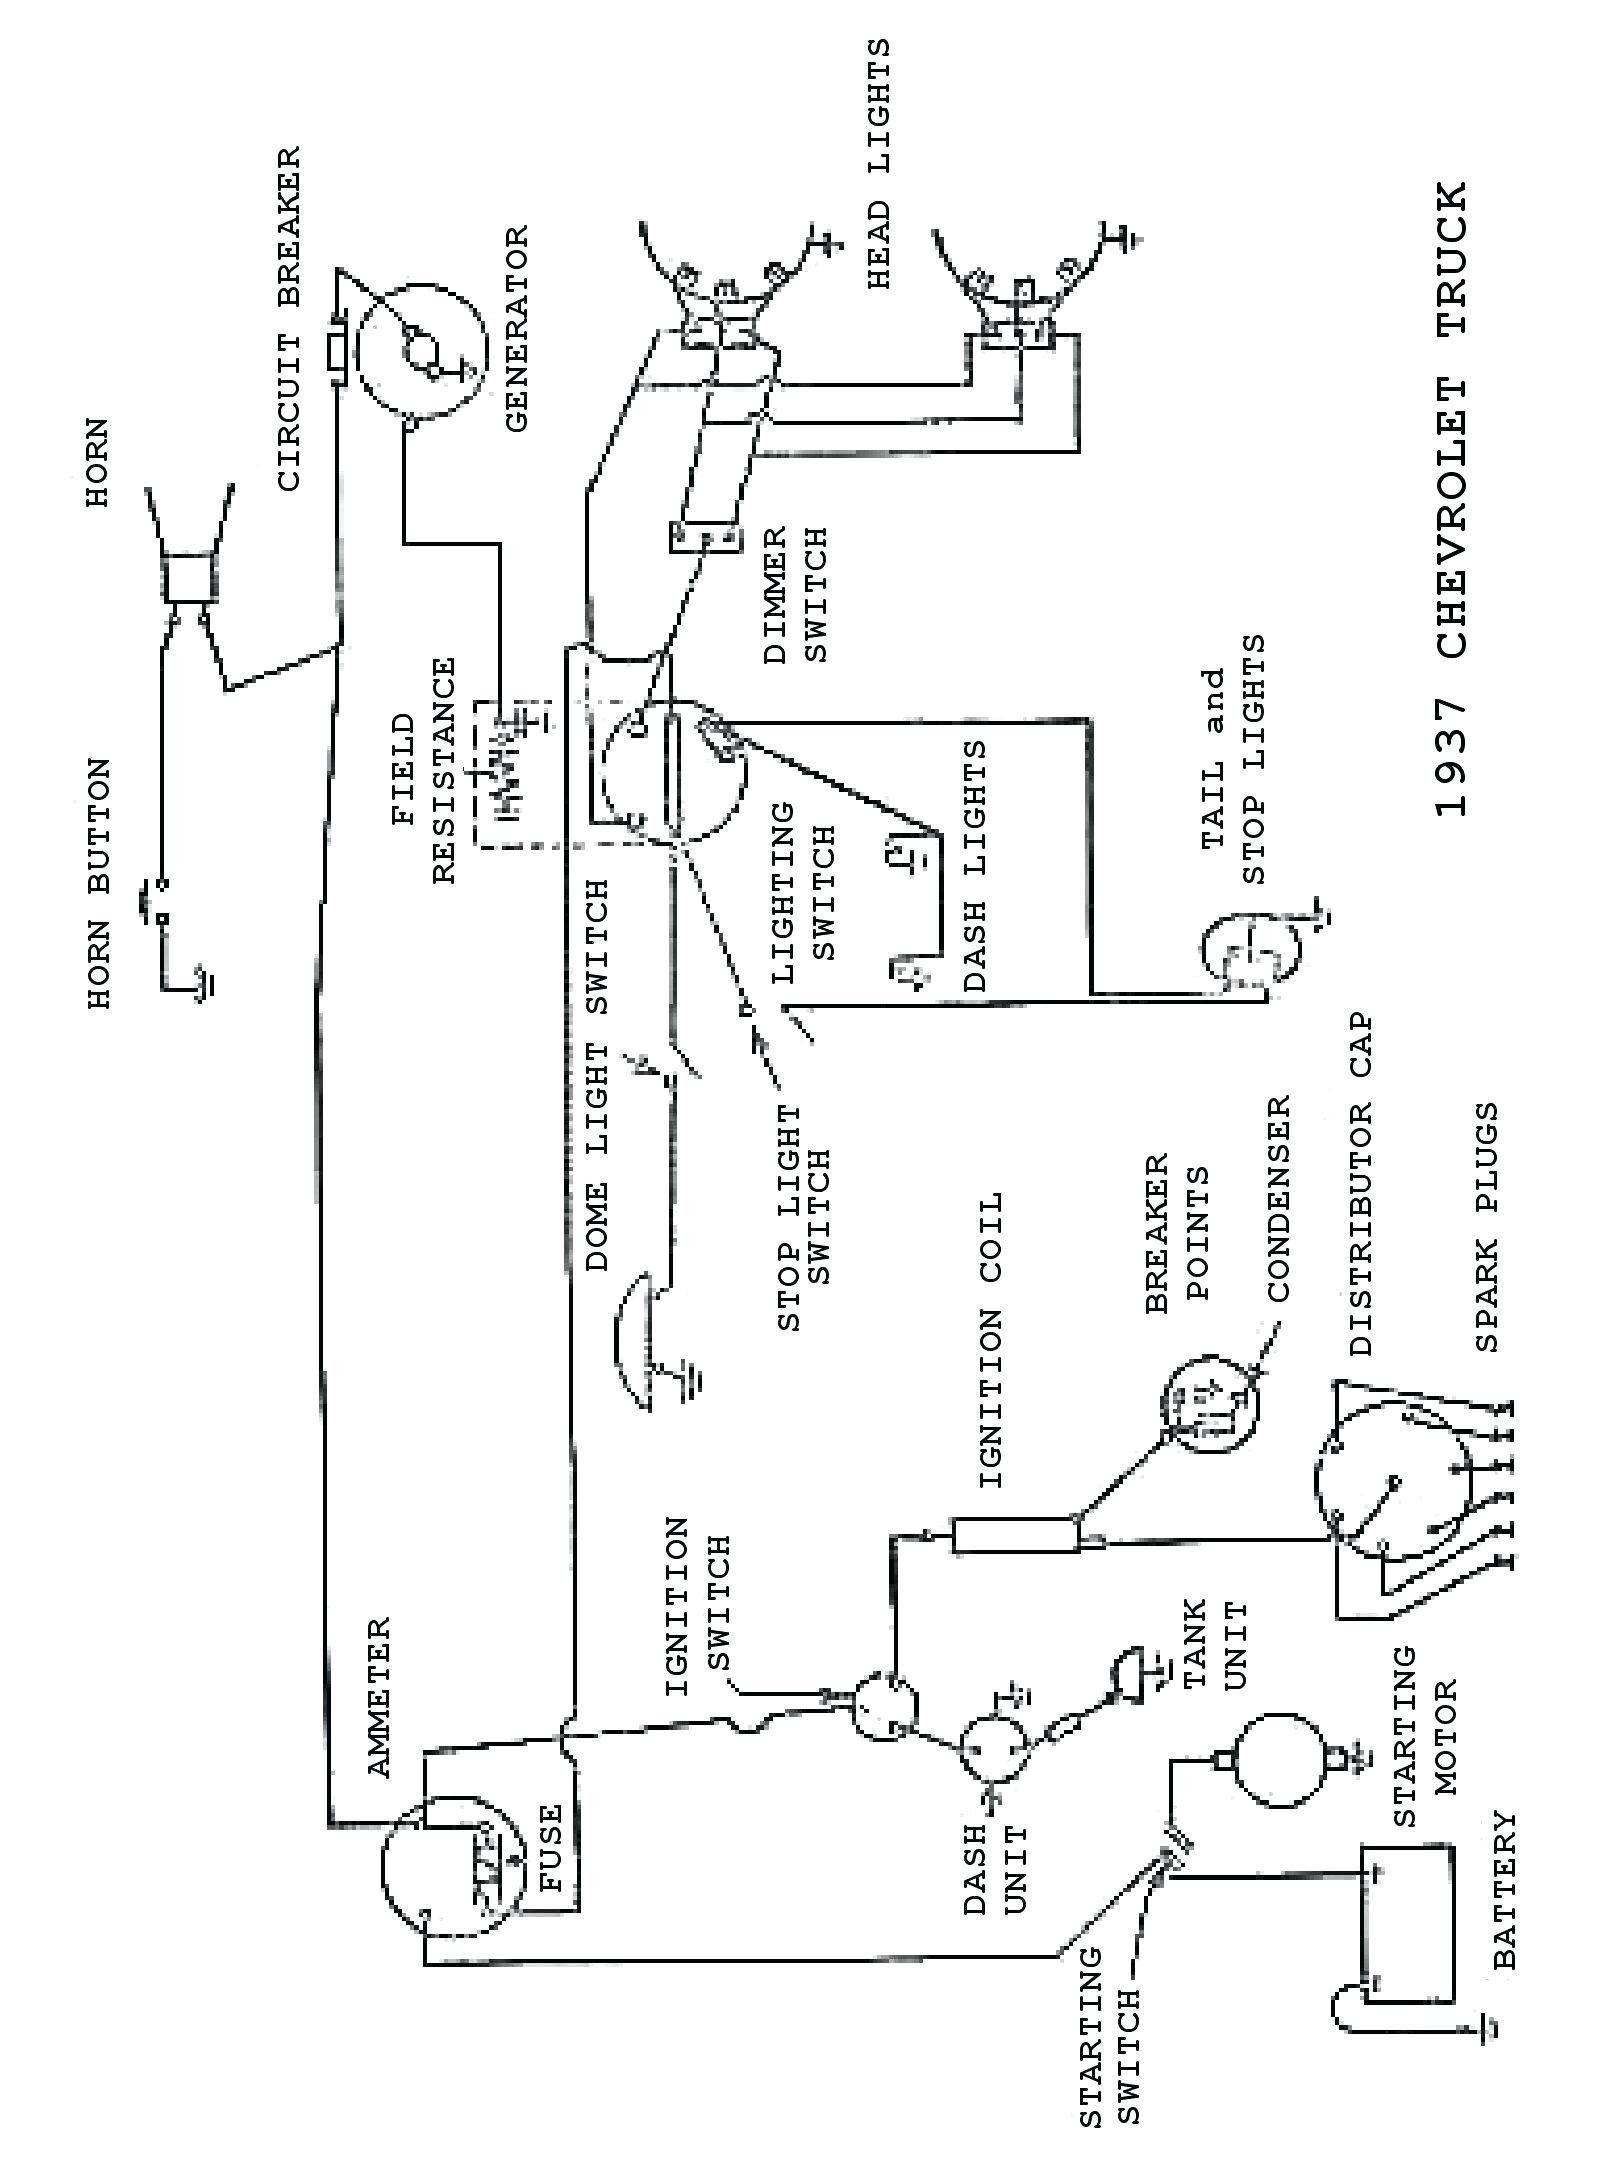 4020 jd wiring diagram wiring diagram data schema John Deere Model 4020 4020 jd wiring diagram basic electronics wiring diagram 4020 john deere wire diagram 4020 jd wiring diagram